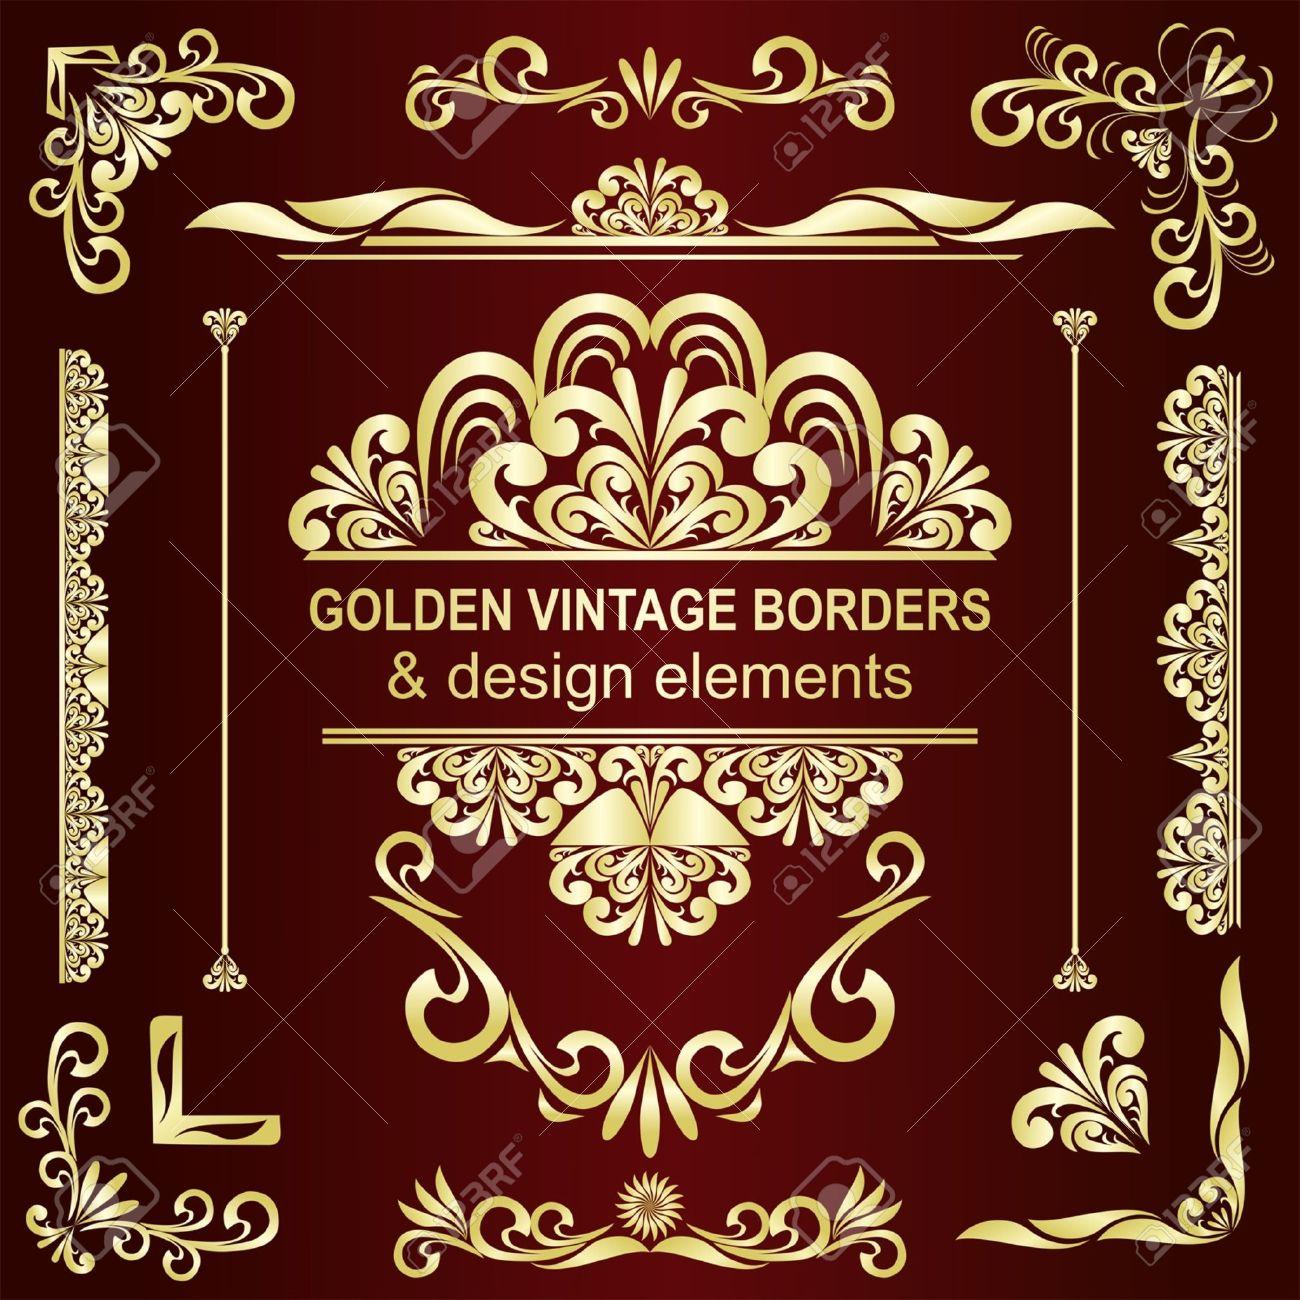 Golden vintage borders   design elements - set Stock Vector - 15780661